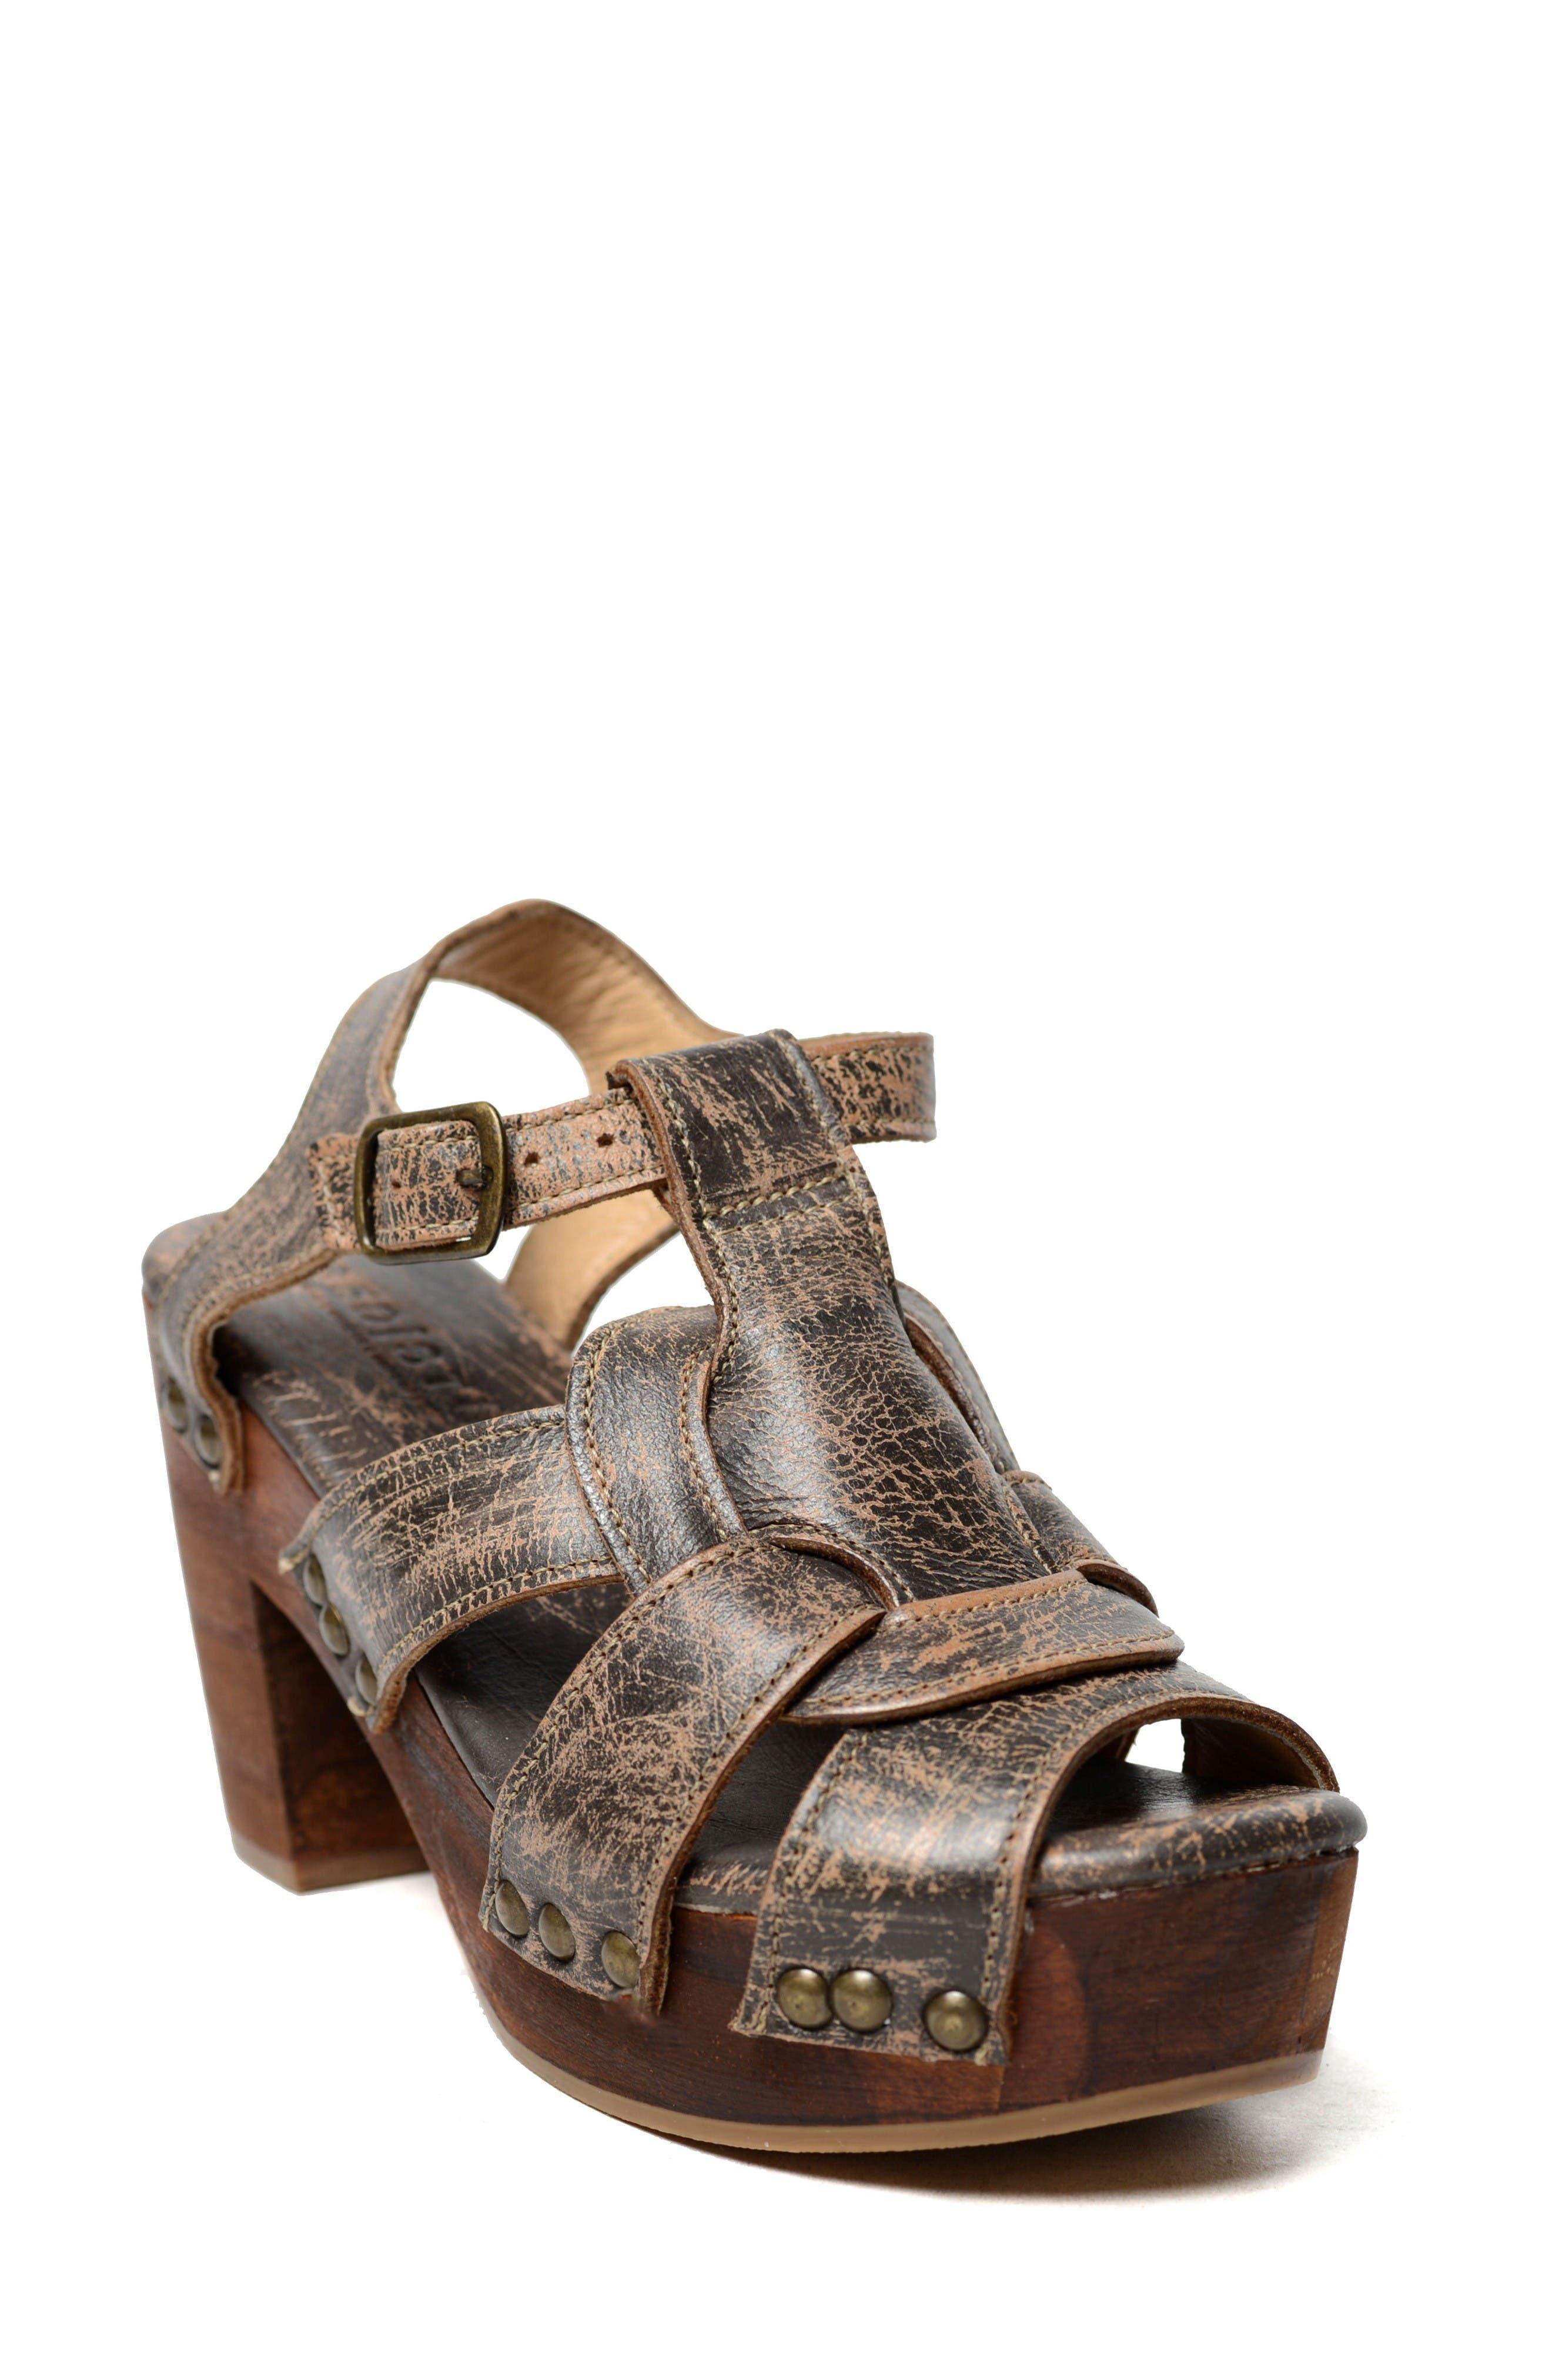 Main Image - Bed Stu Caitlin Block Heel Sandal (Women)